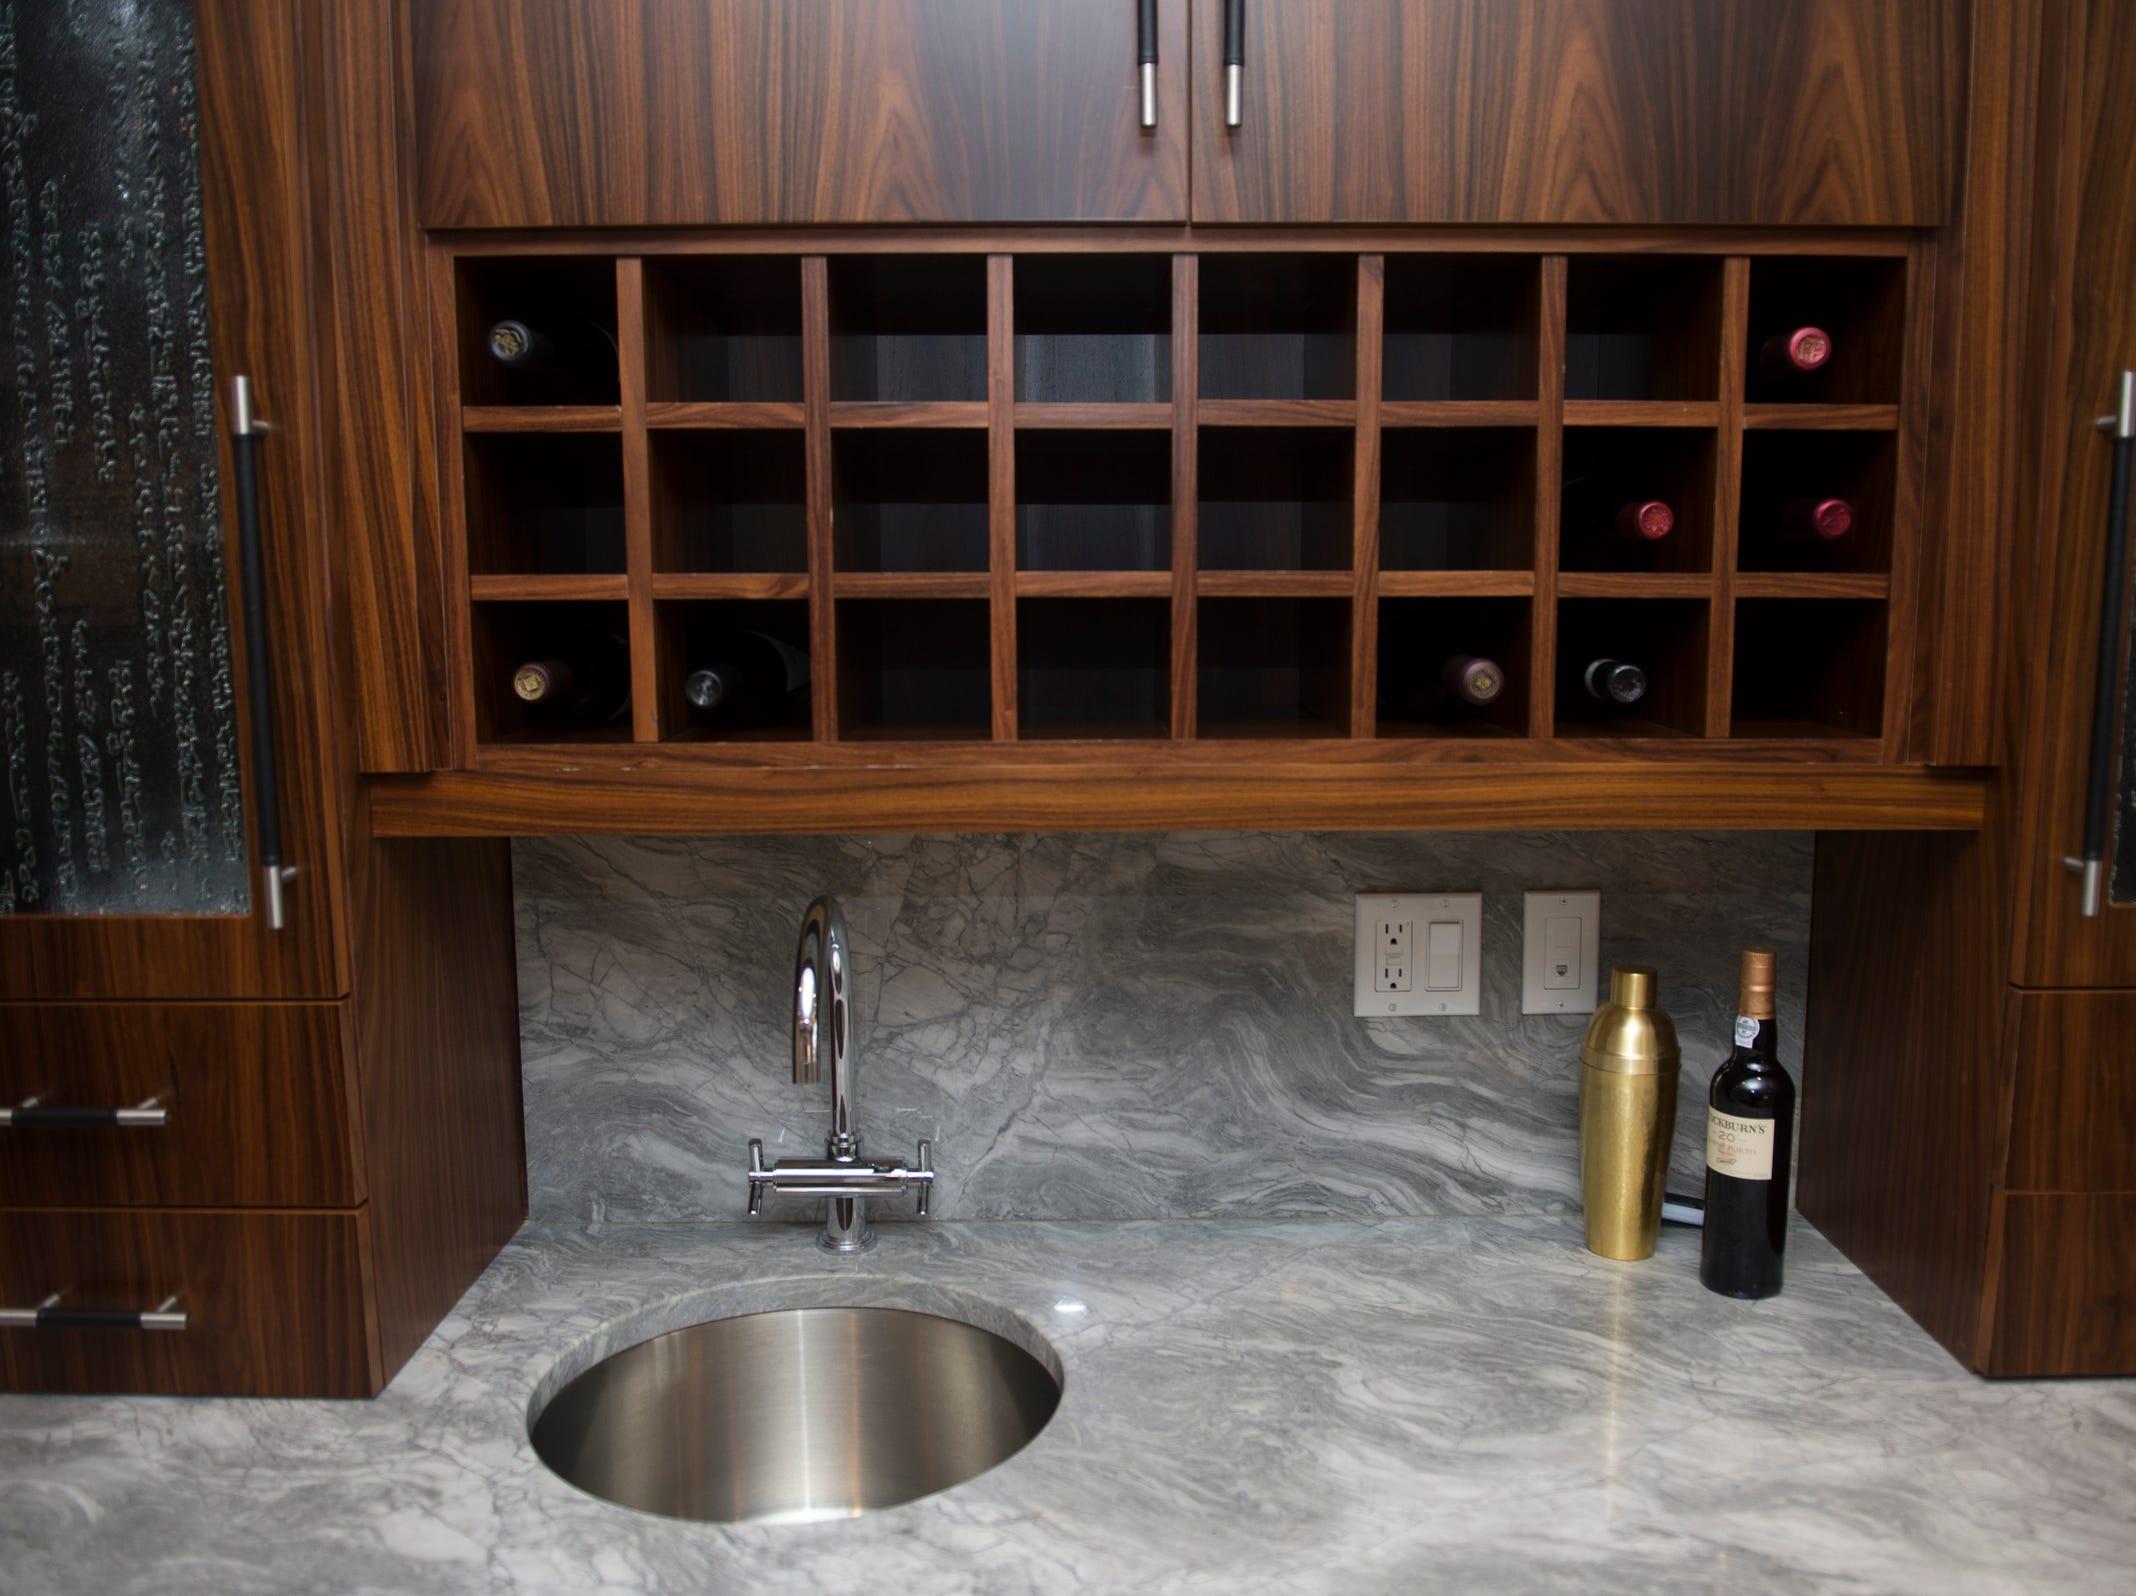 The basement hangout room includes a wet bar.